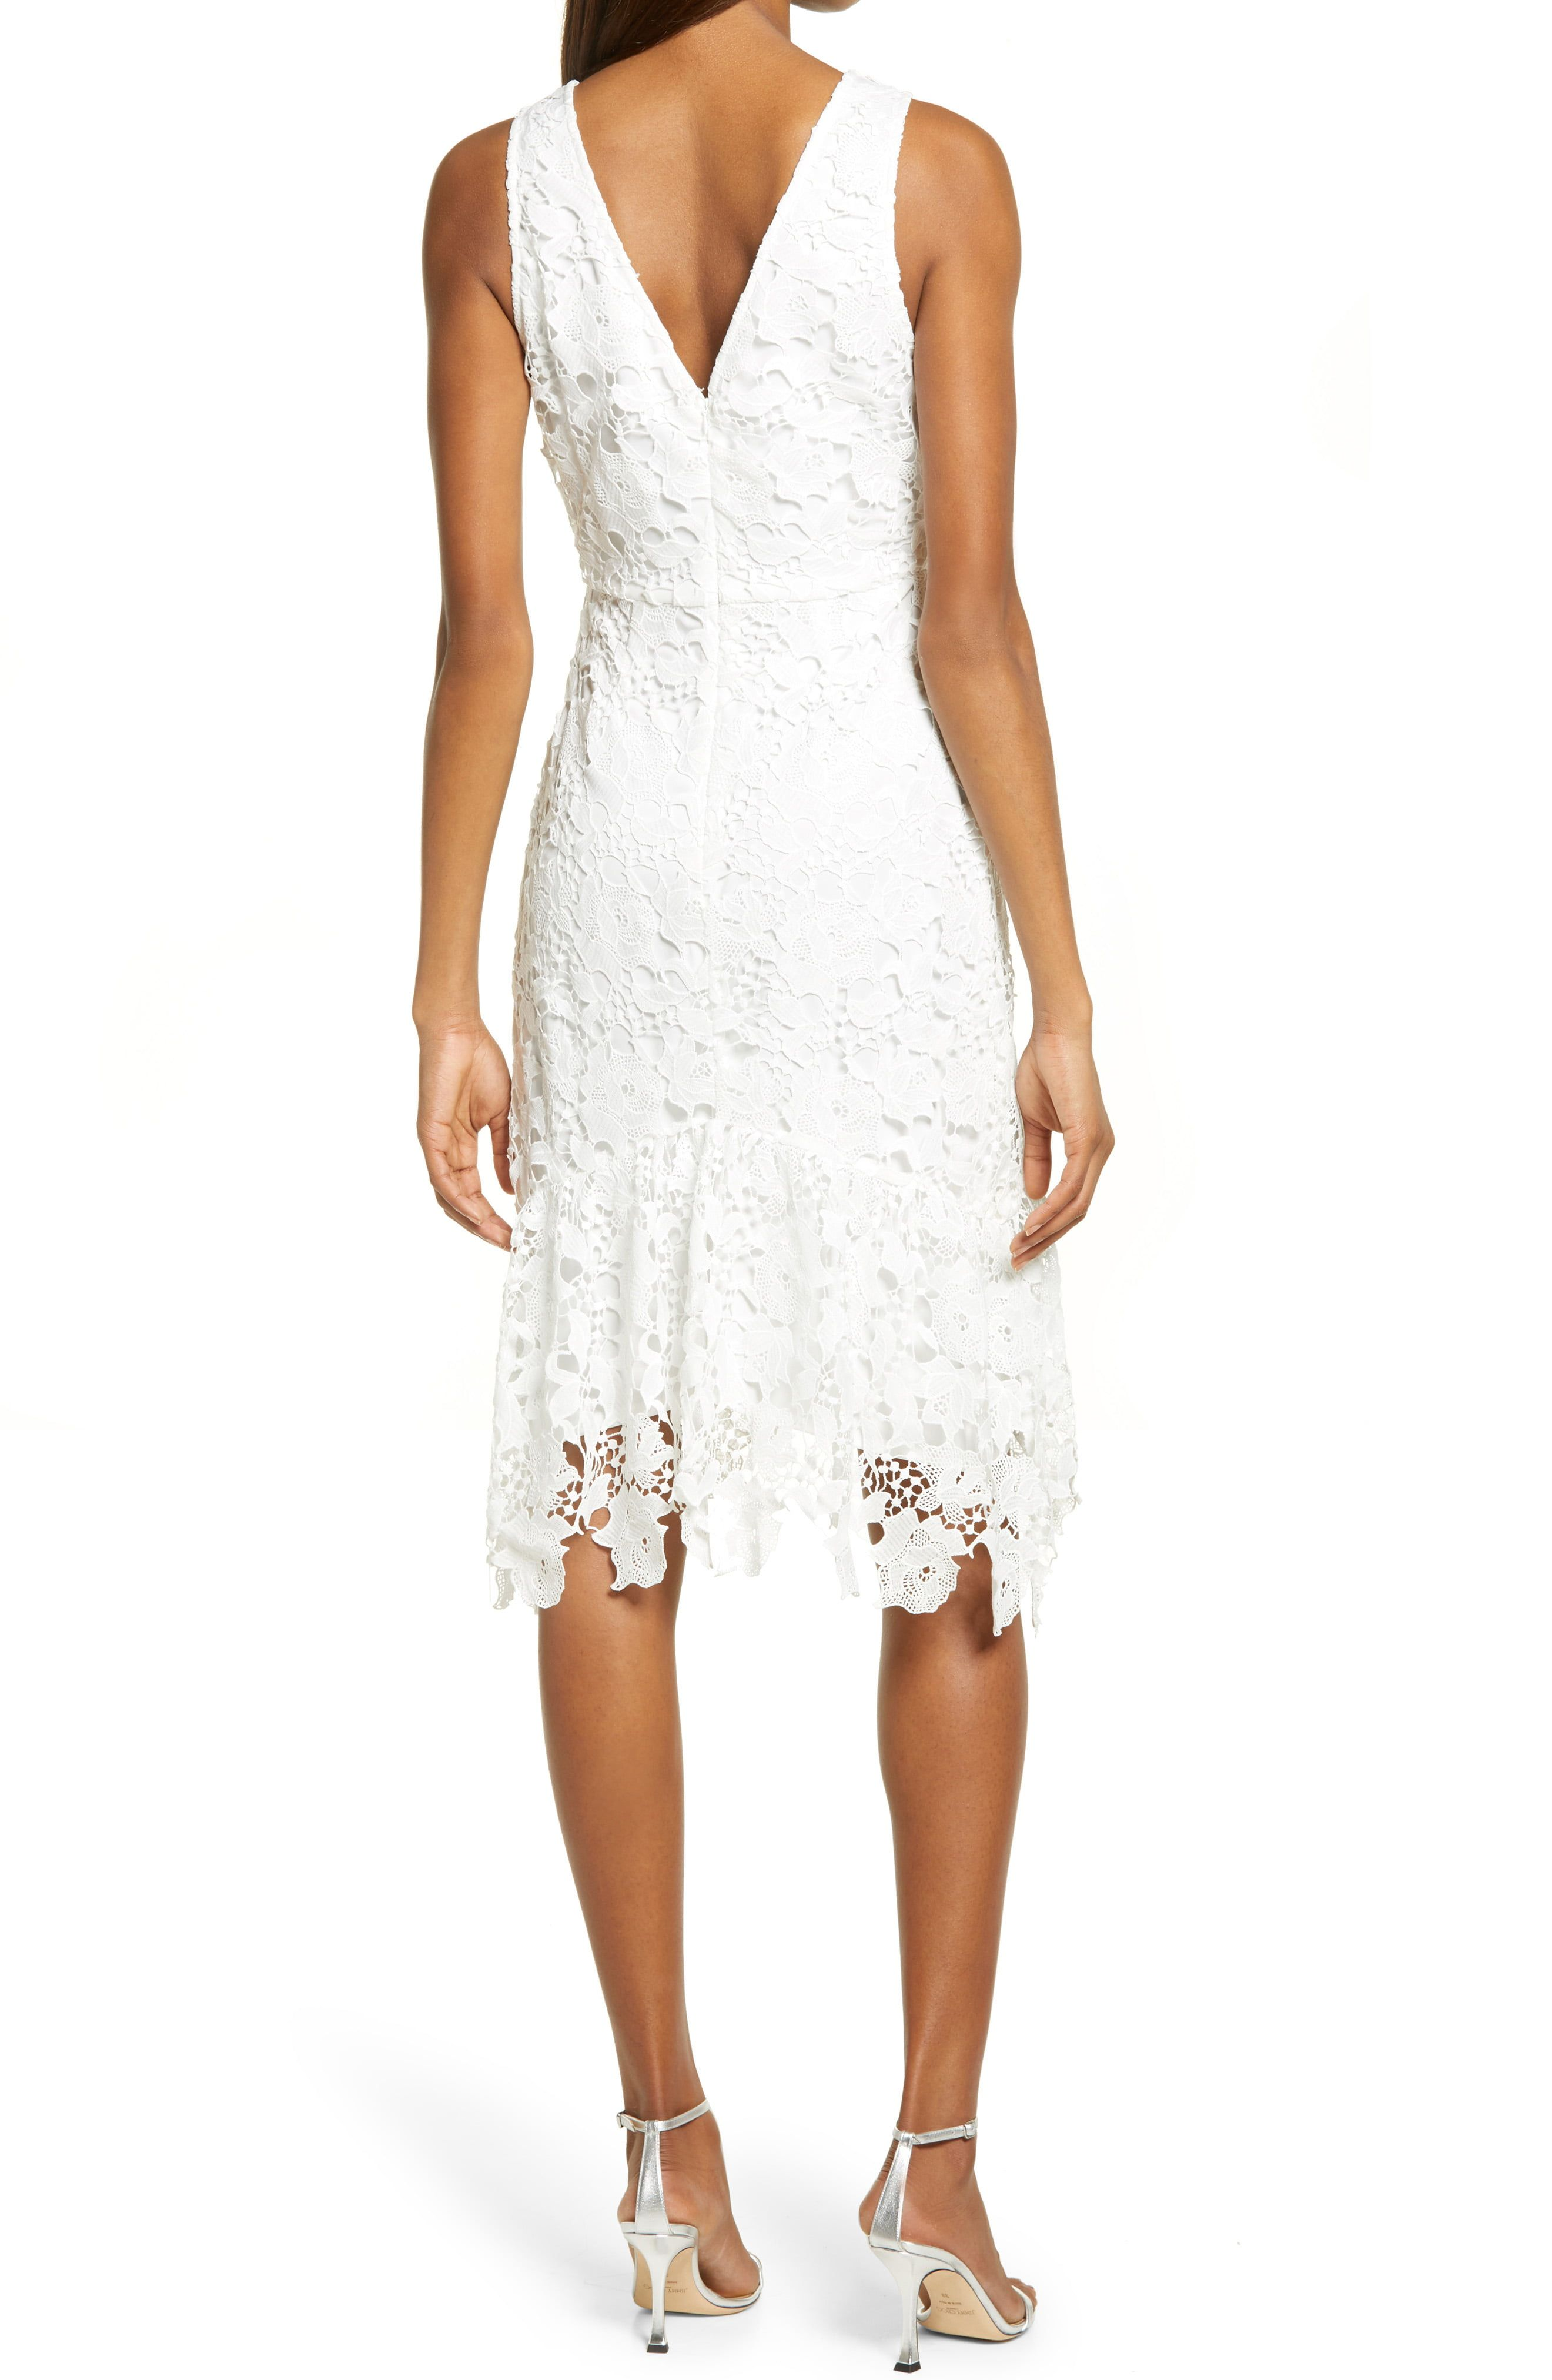 Floret Studios Lace Sheath Dress Nordstrom In 2021 Nordstrom Dresses Dresses Sheath Dress [ 4048 x 2640 Pixel ]